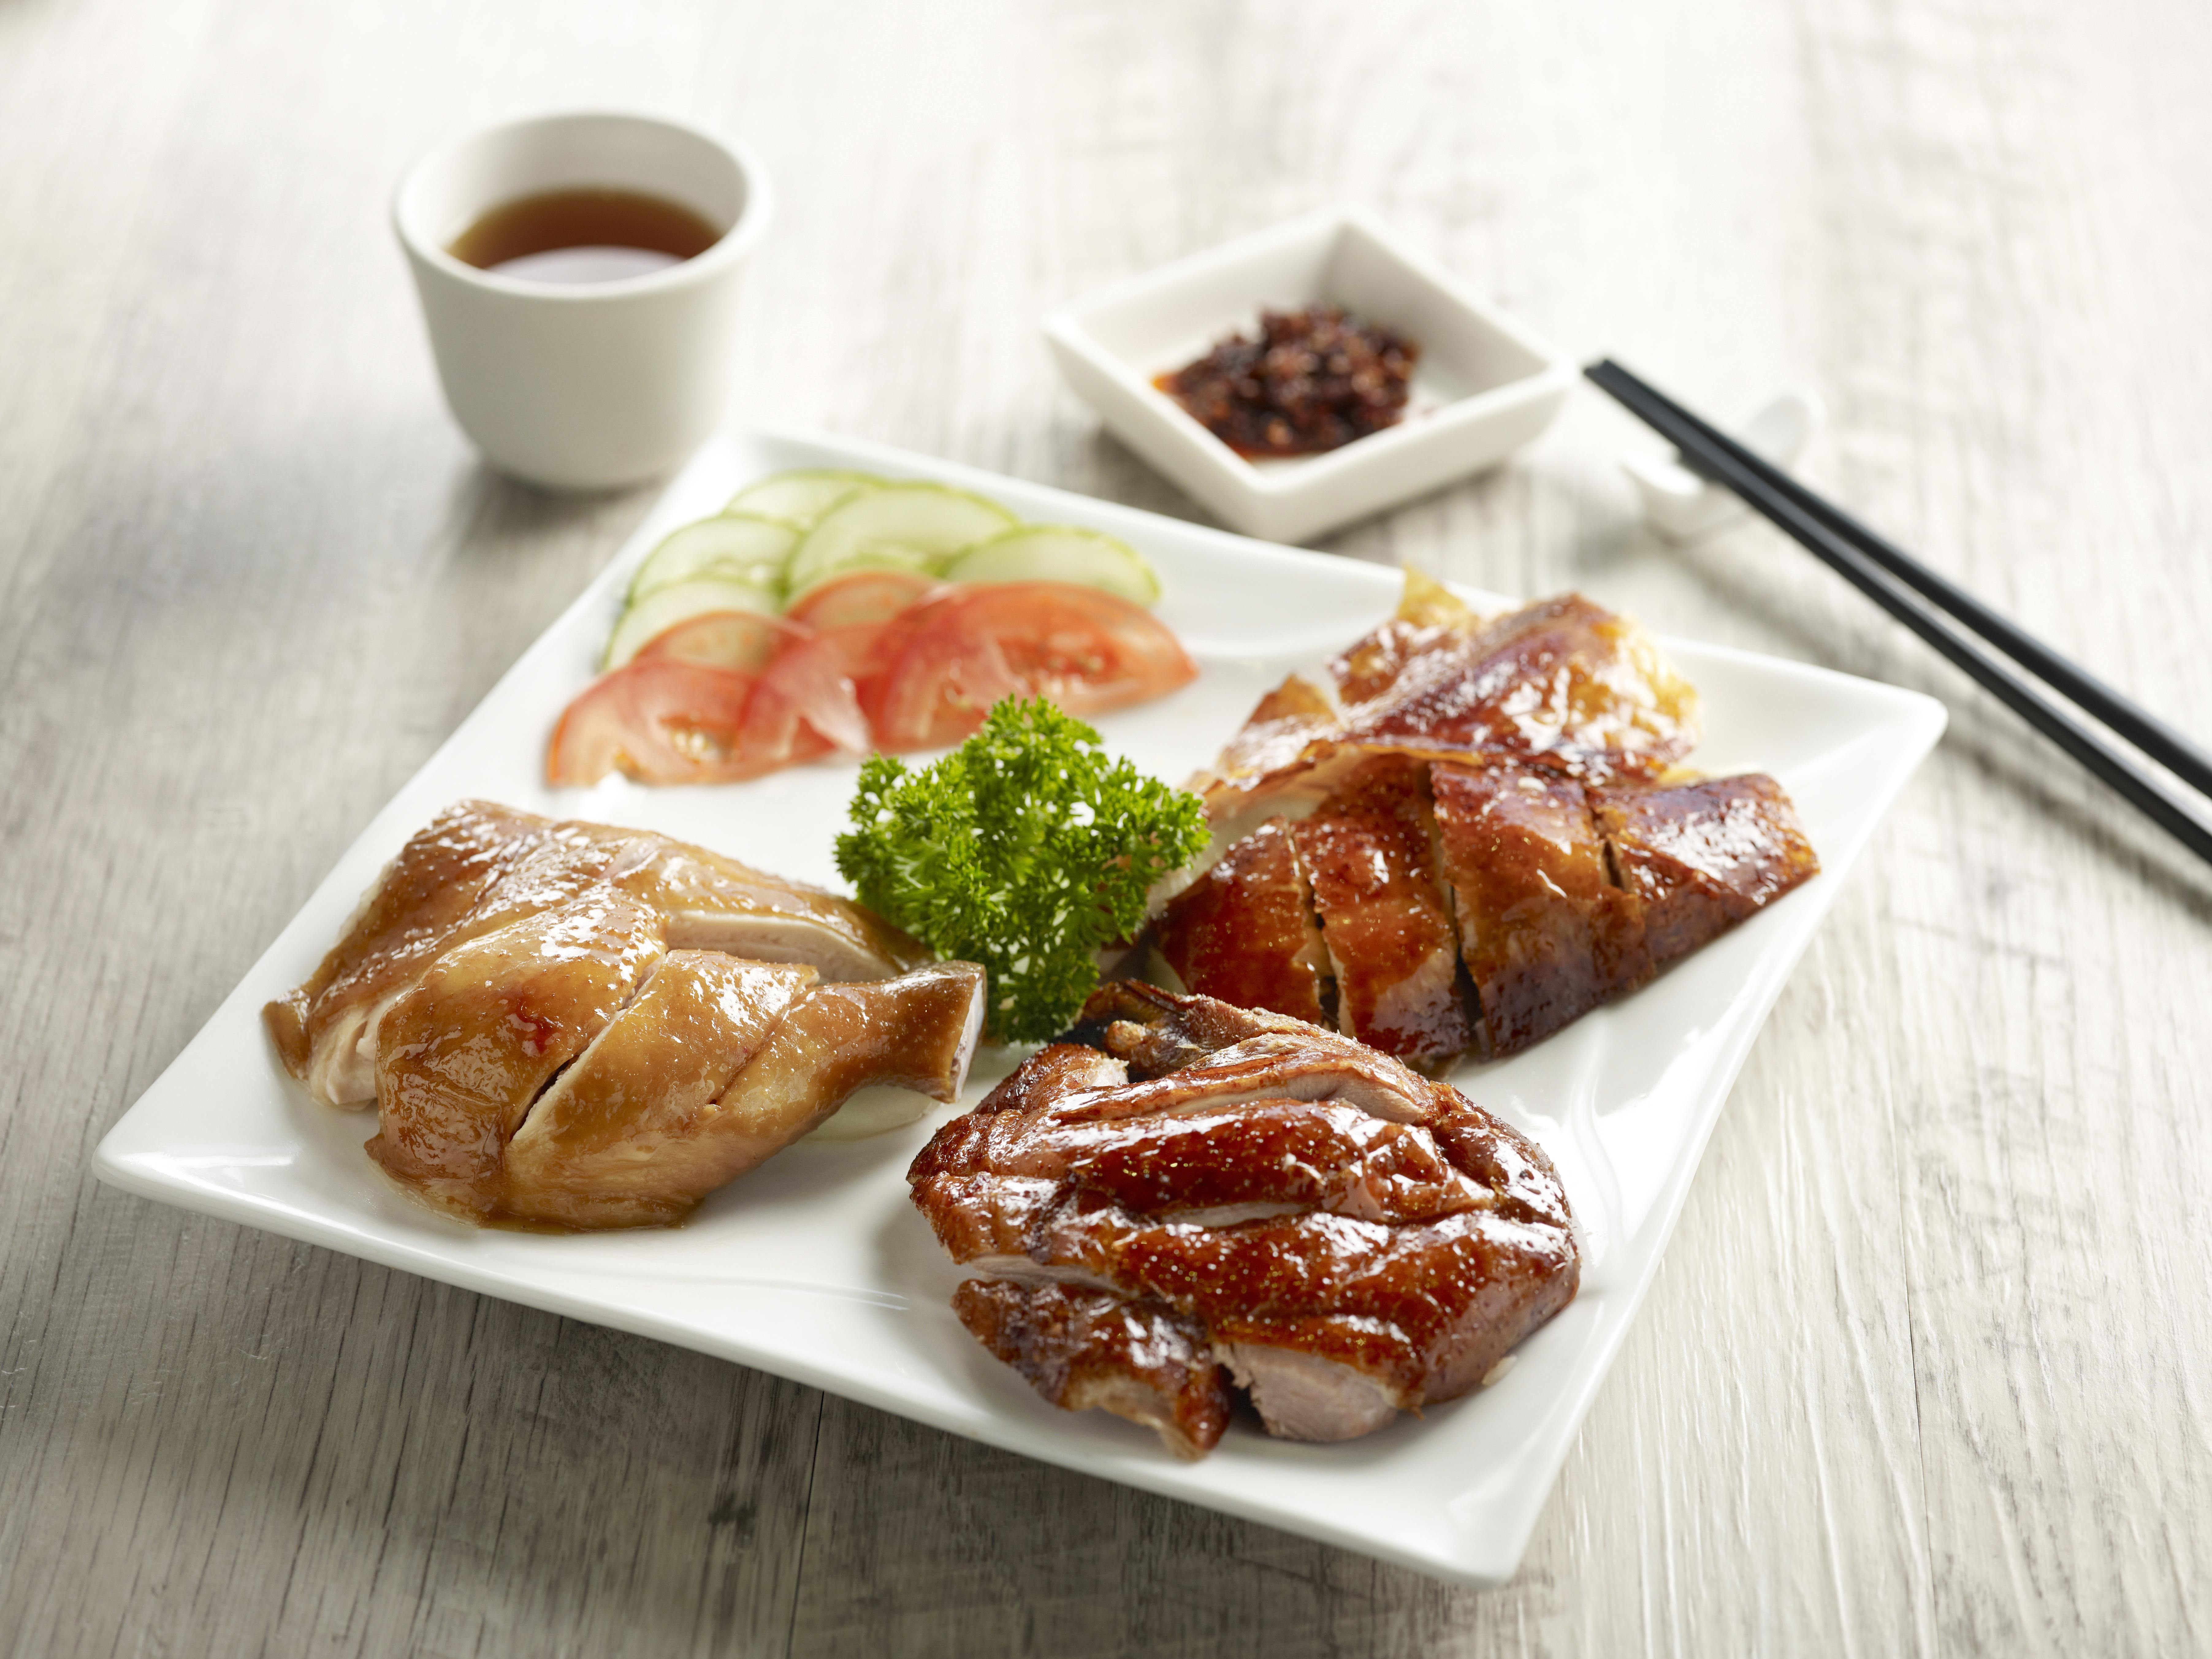 The Asian Kitchen 亚洲小厨 Launches New Roast Menu Items In The CBD